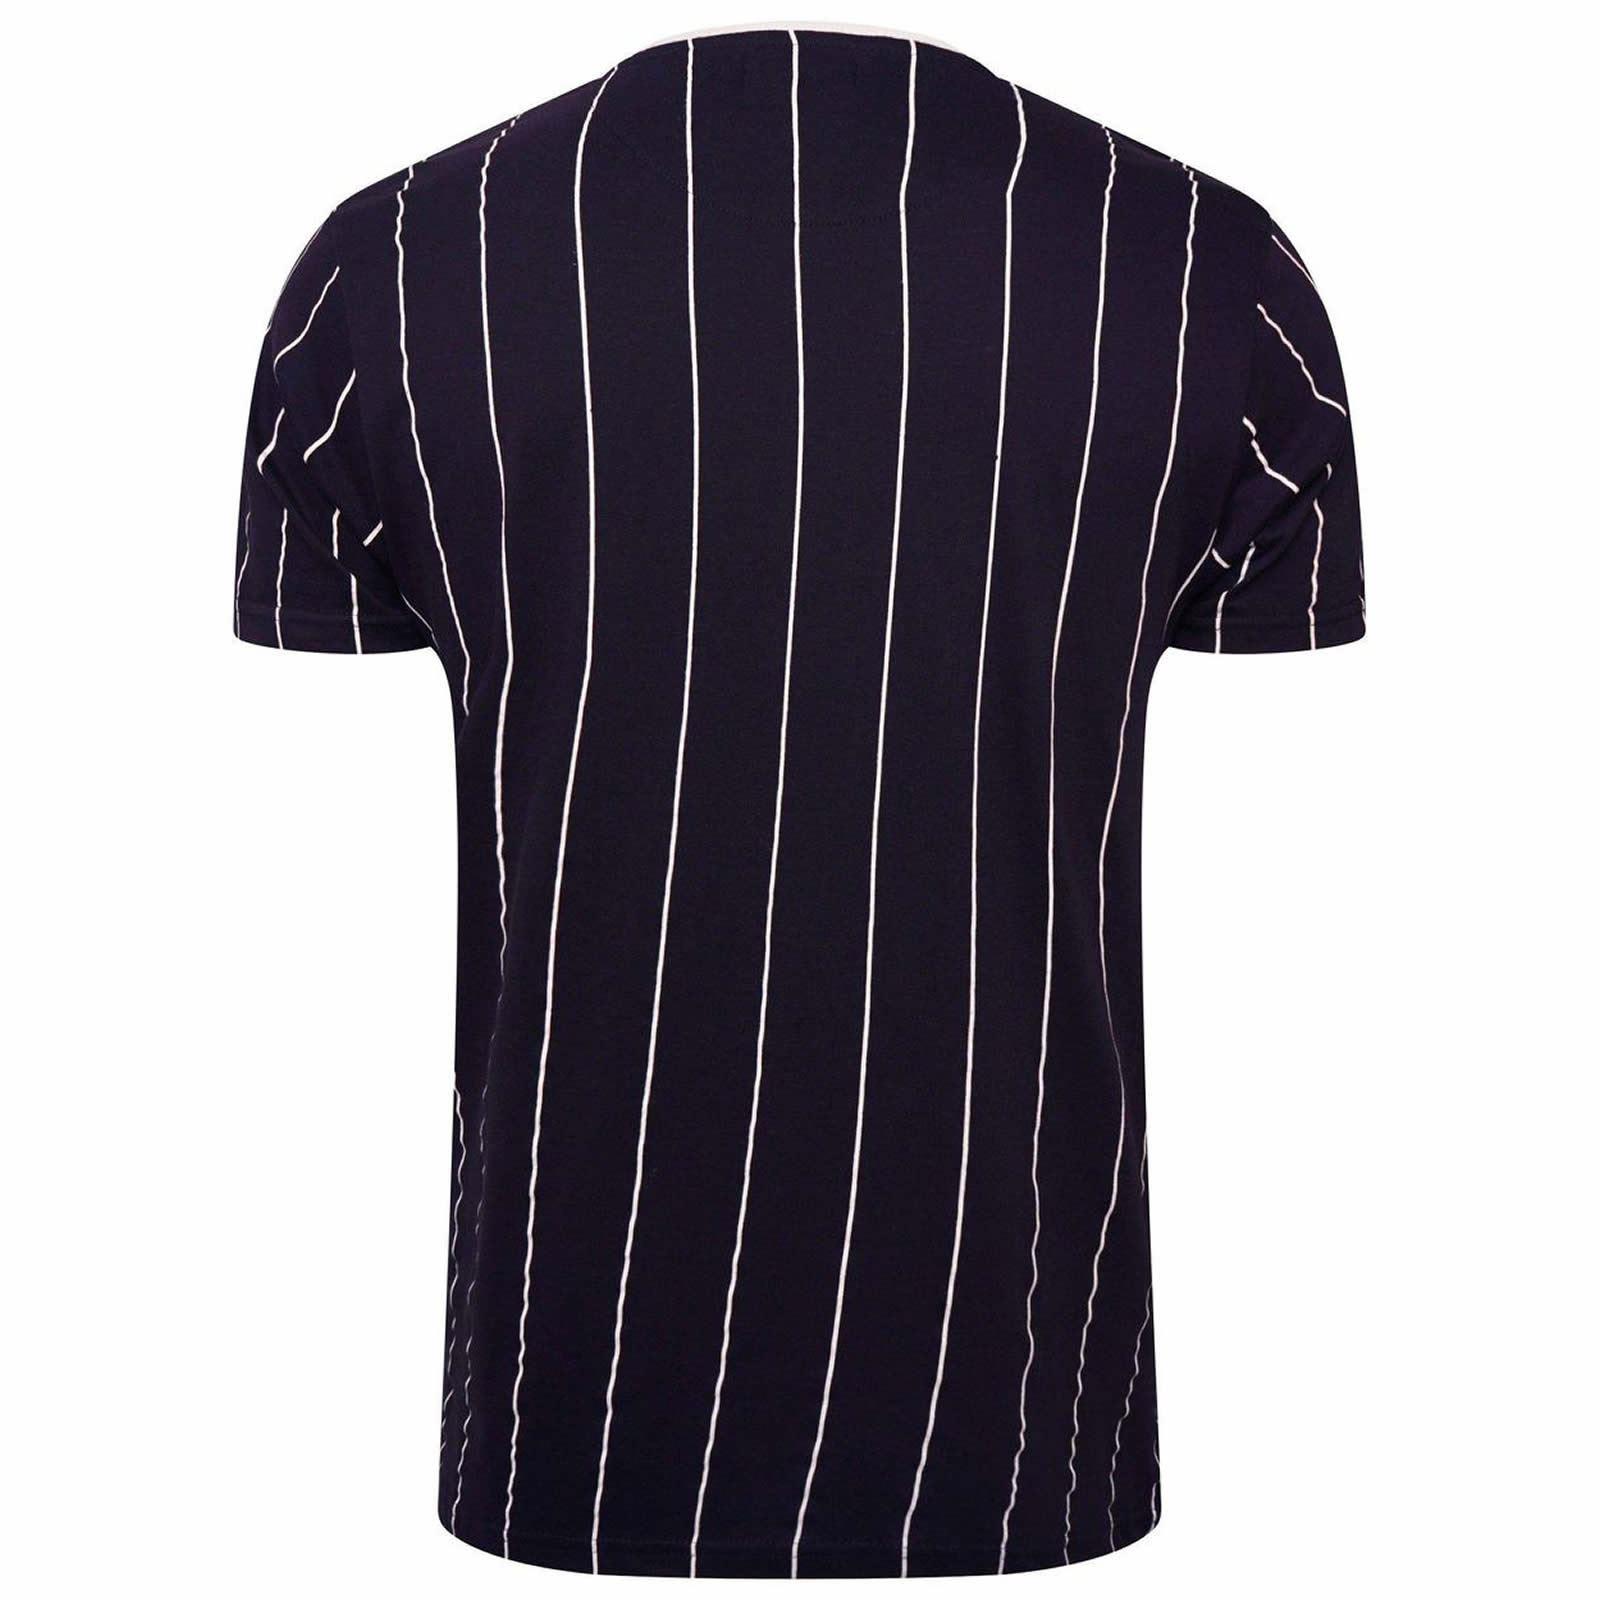 Hommes-T-Shirt-Brave-Soul-Stobart-a-encolure-ras-du-cou-a-manches-courtes-a-rayures-verticales-Tee miniature 7